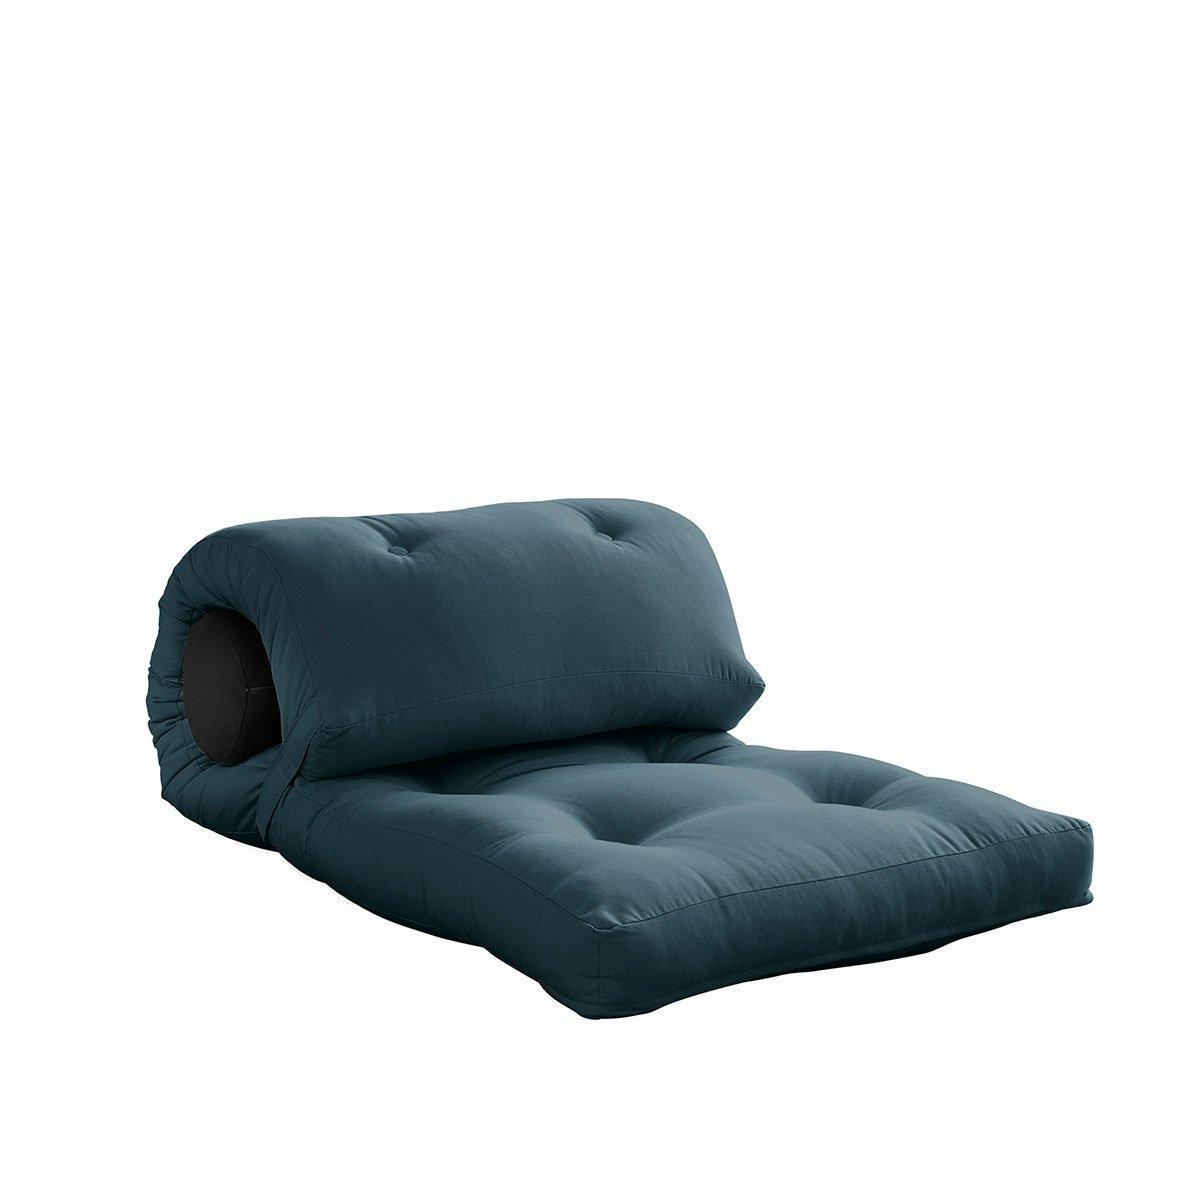 Variabilný matrac Wrap – Petrol Blue/Dark Grey